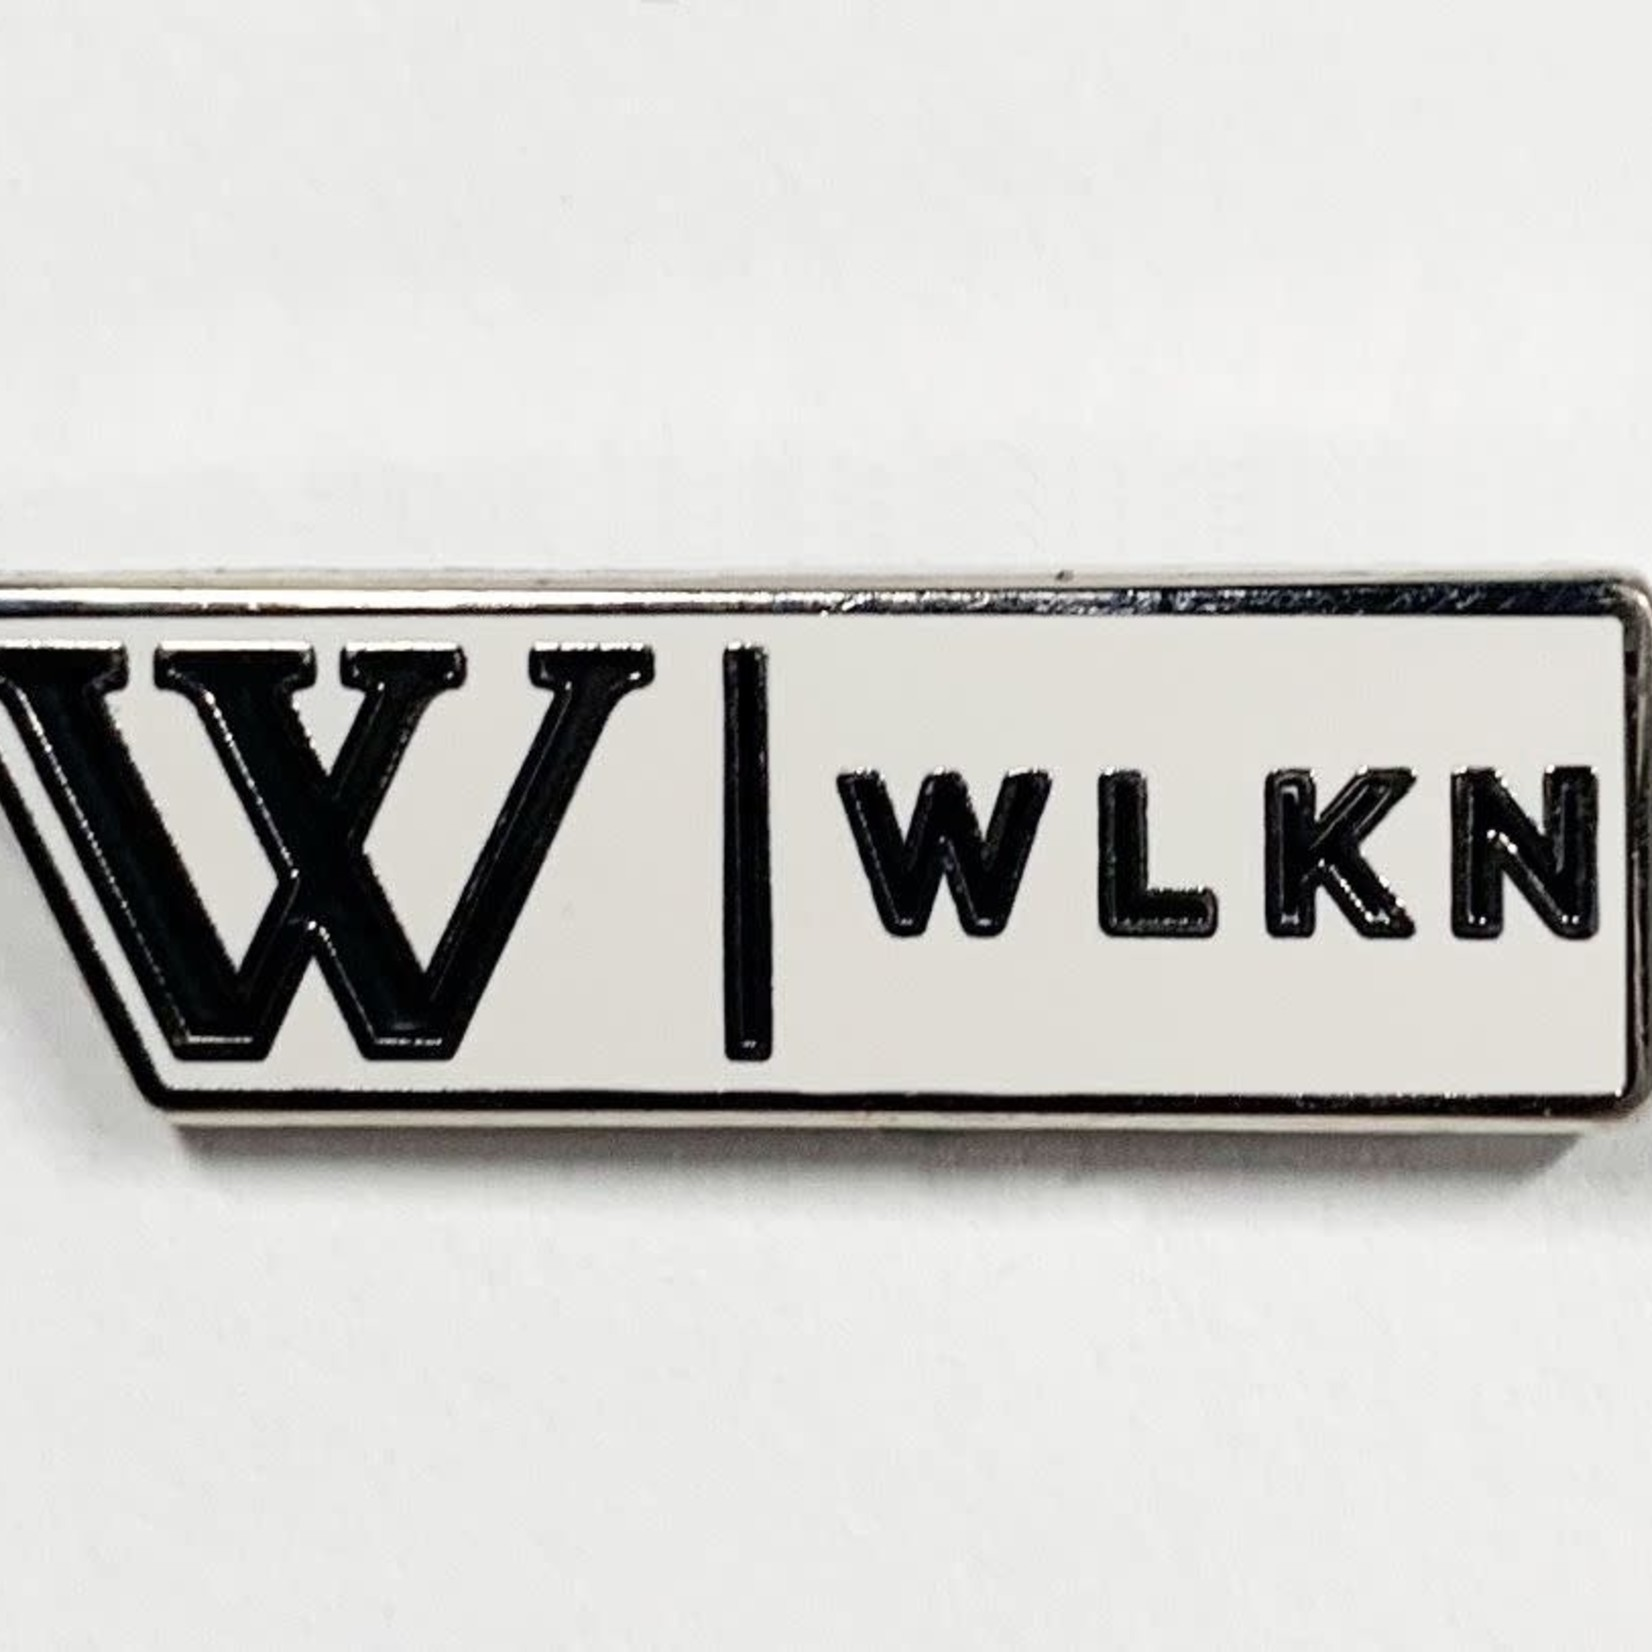 WLKN WLKN : The Building Signature Pin Silver White Black O/S